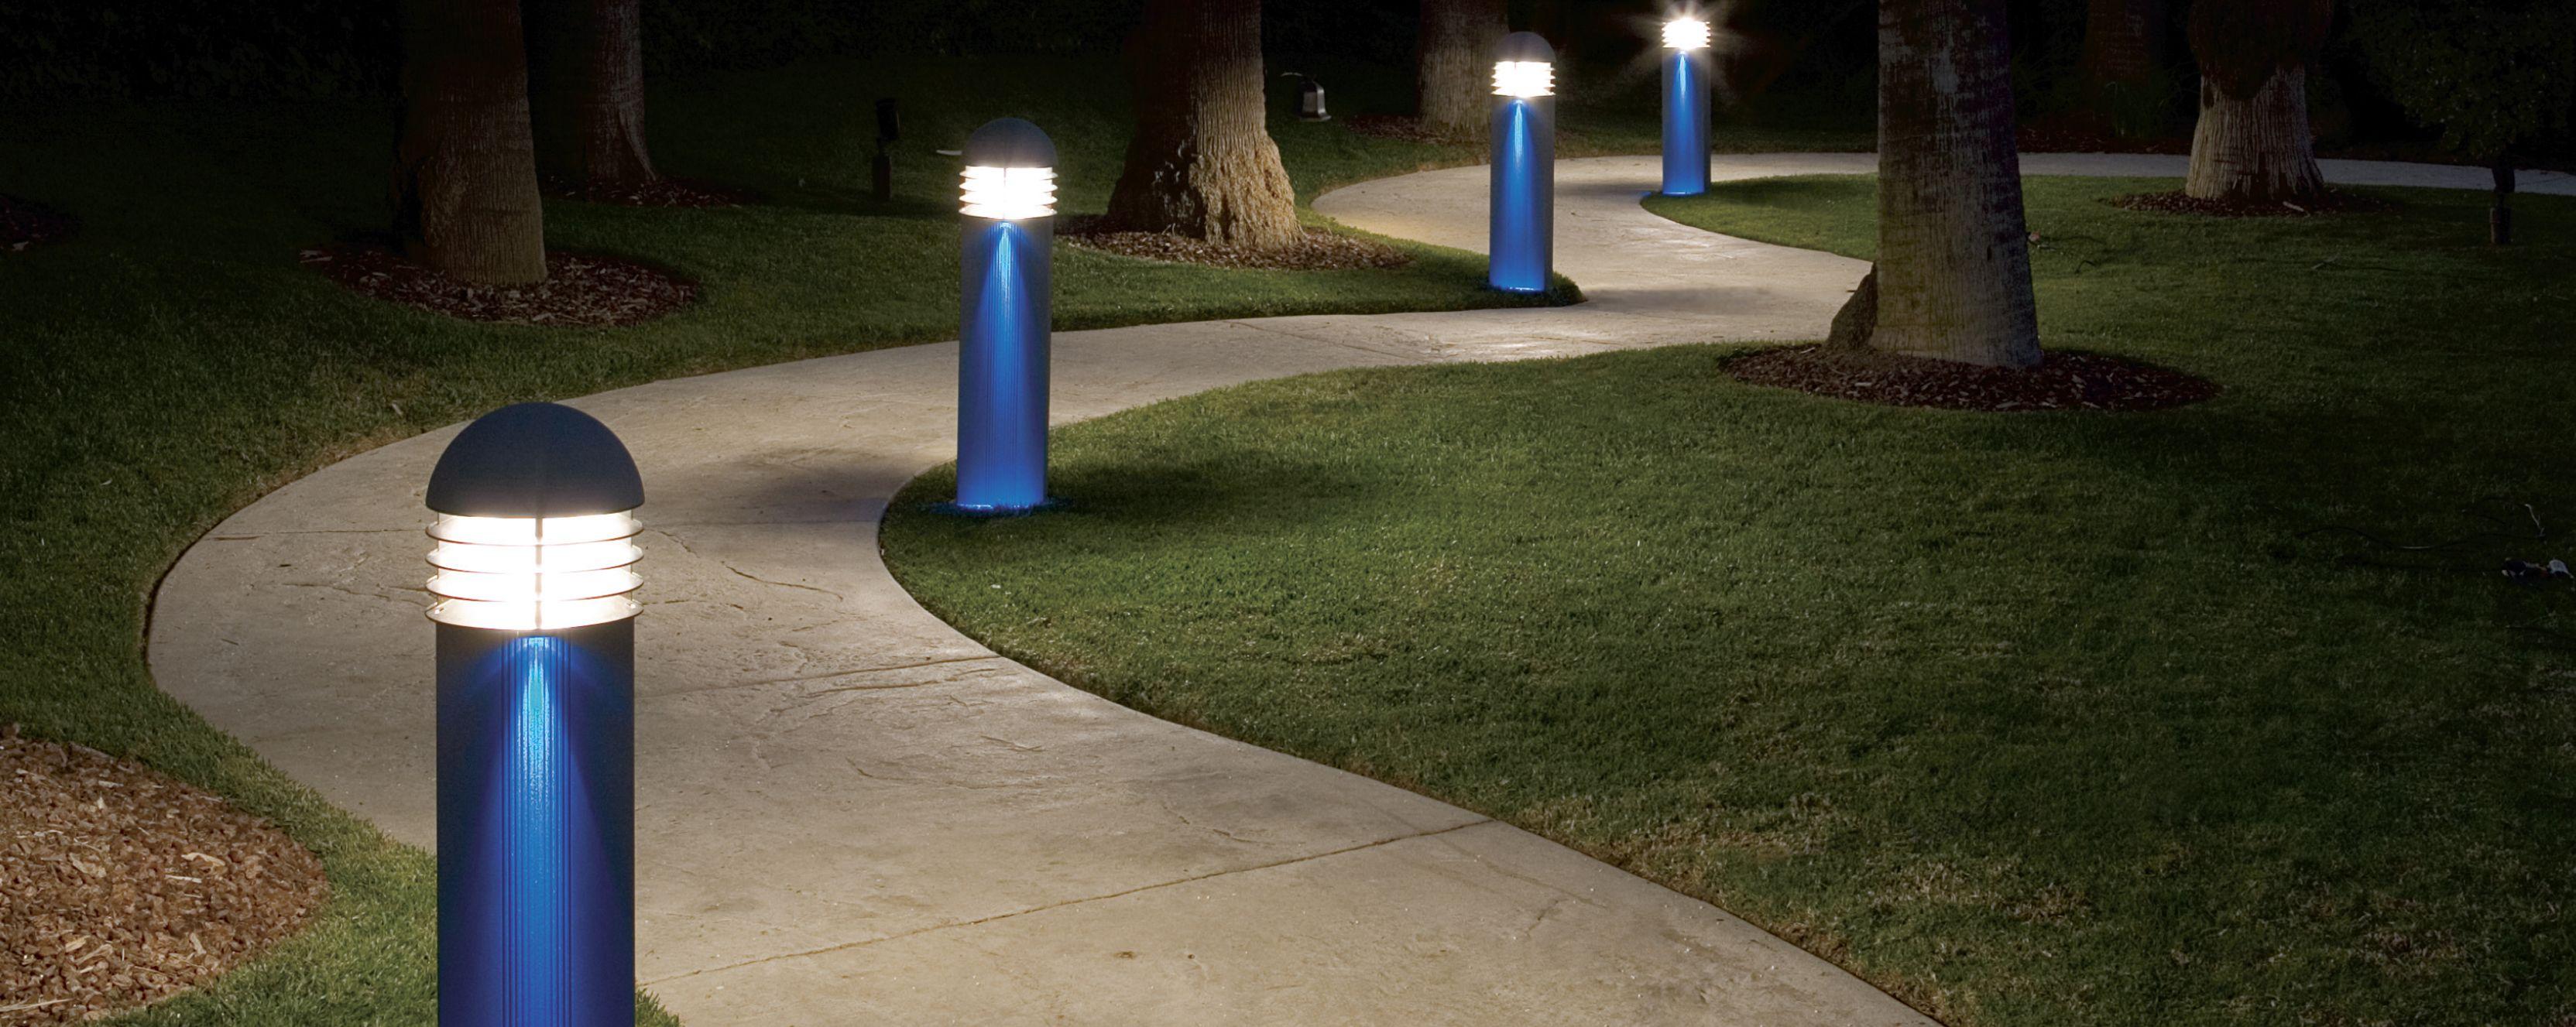 Bollard landing 2 outdoor lighting pinterest outdoor lighting love to decor your walkway or pathways here are beautiful walkway lighting ideas that surely enhance your walkway design aloadofball Images